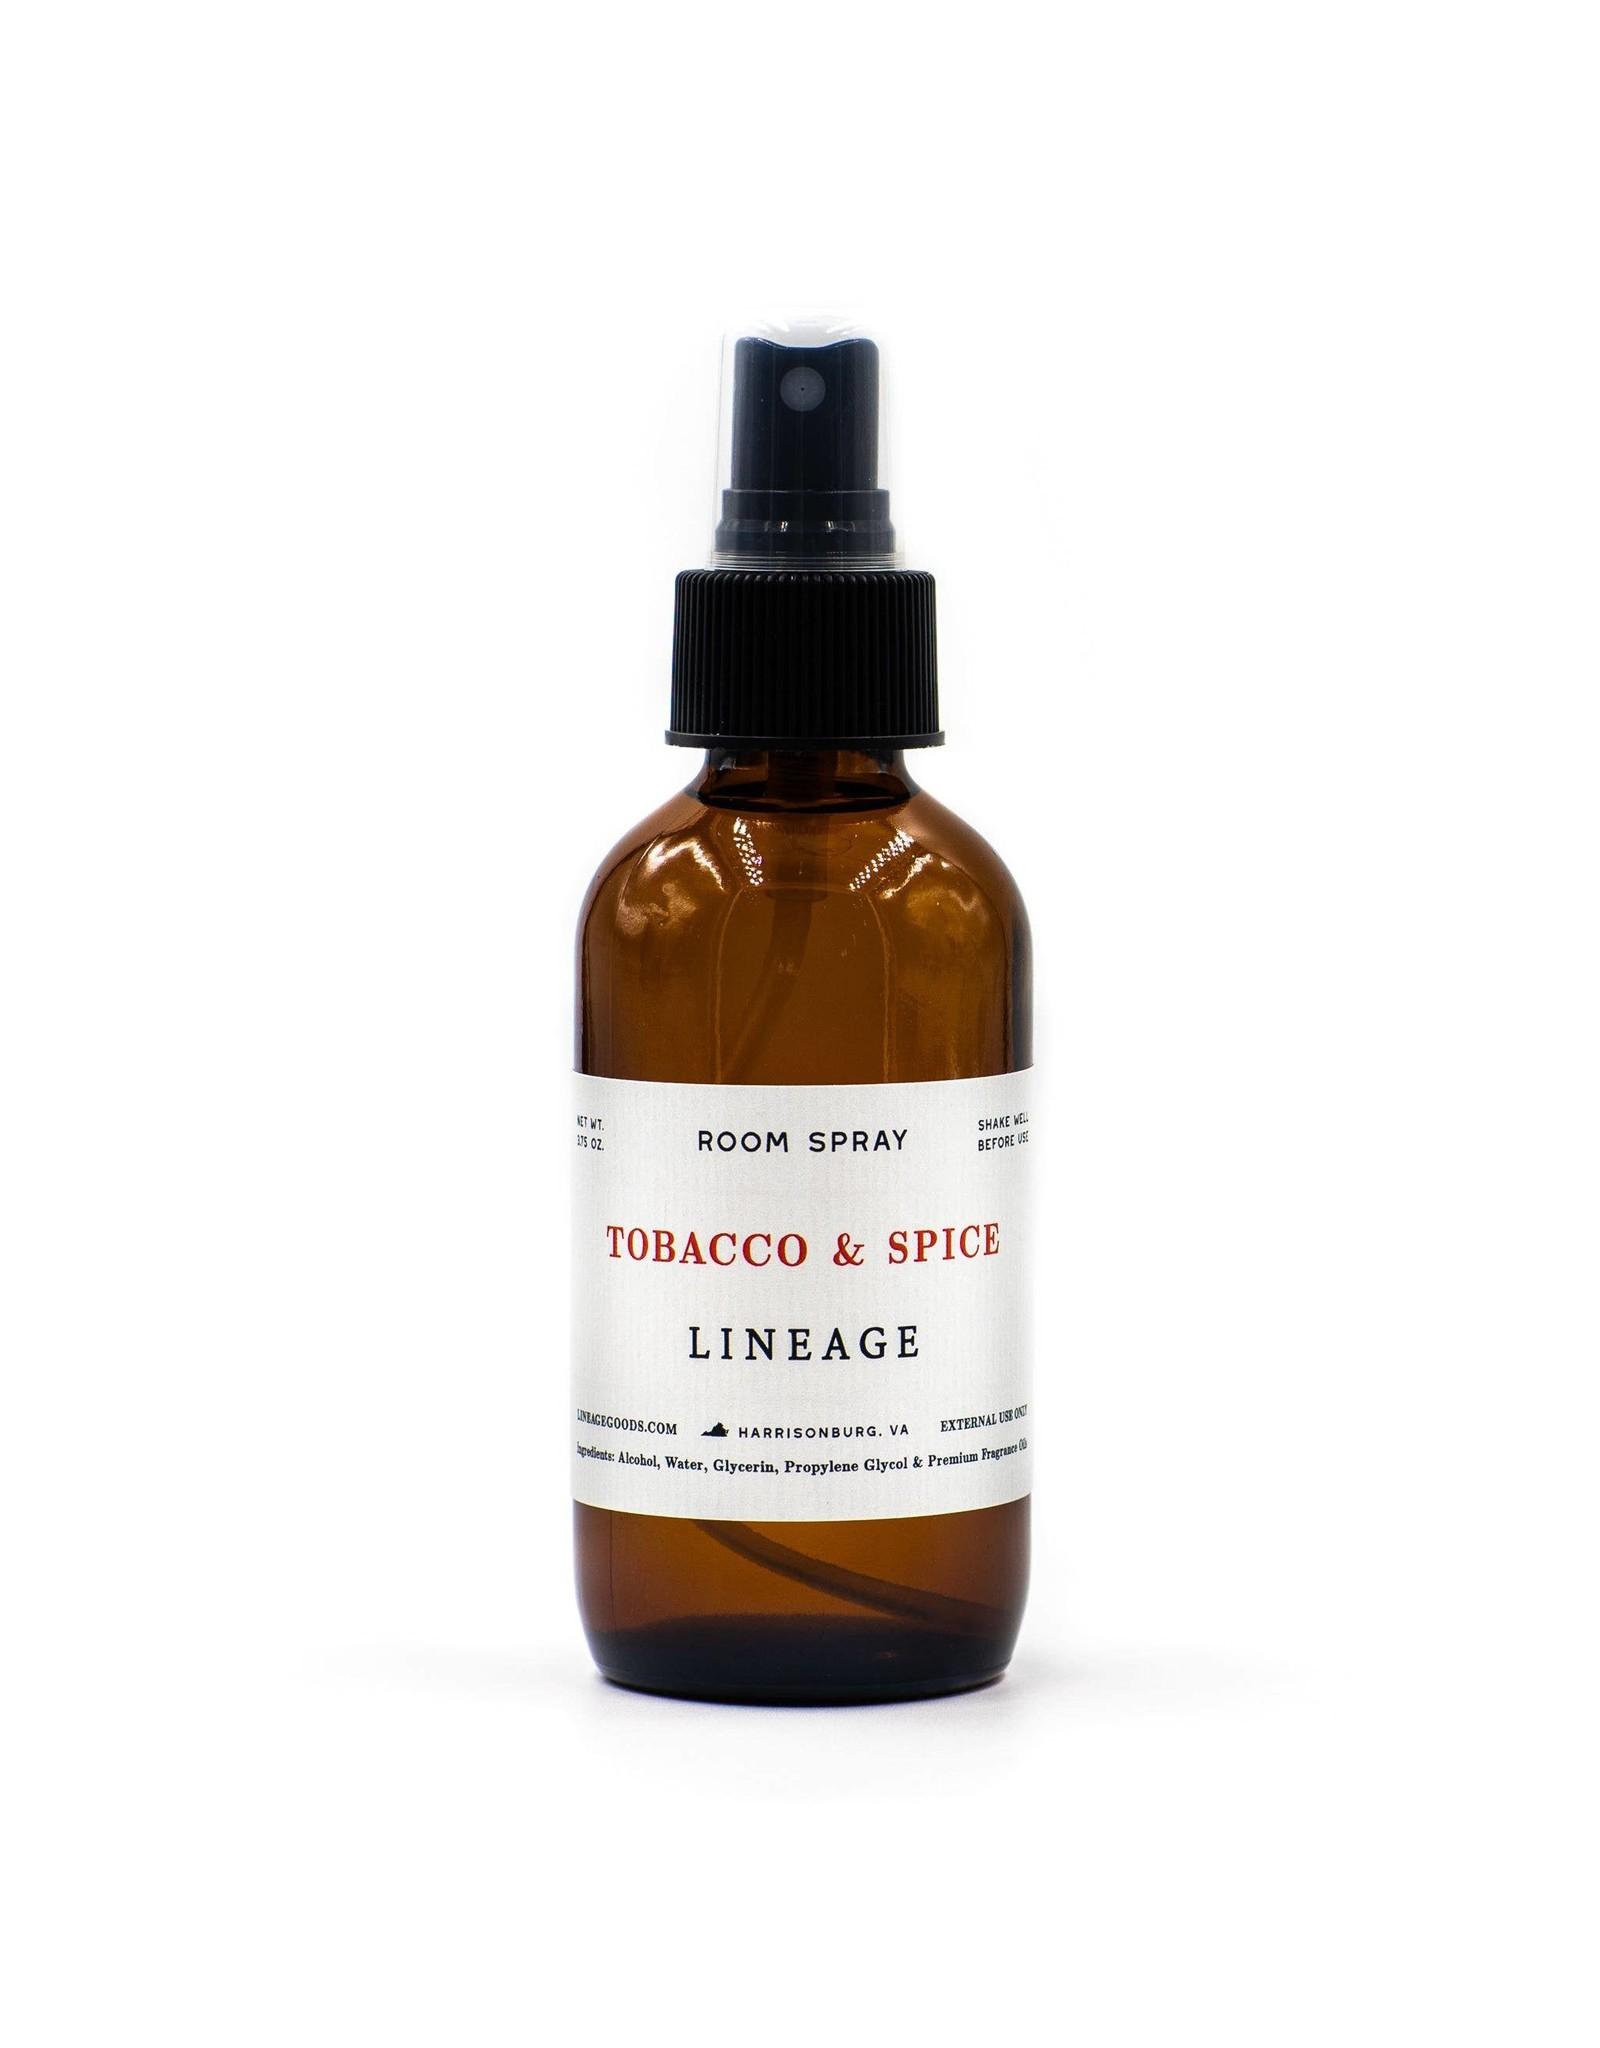 Lineage Tobacco & Spice Room Spray